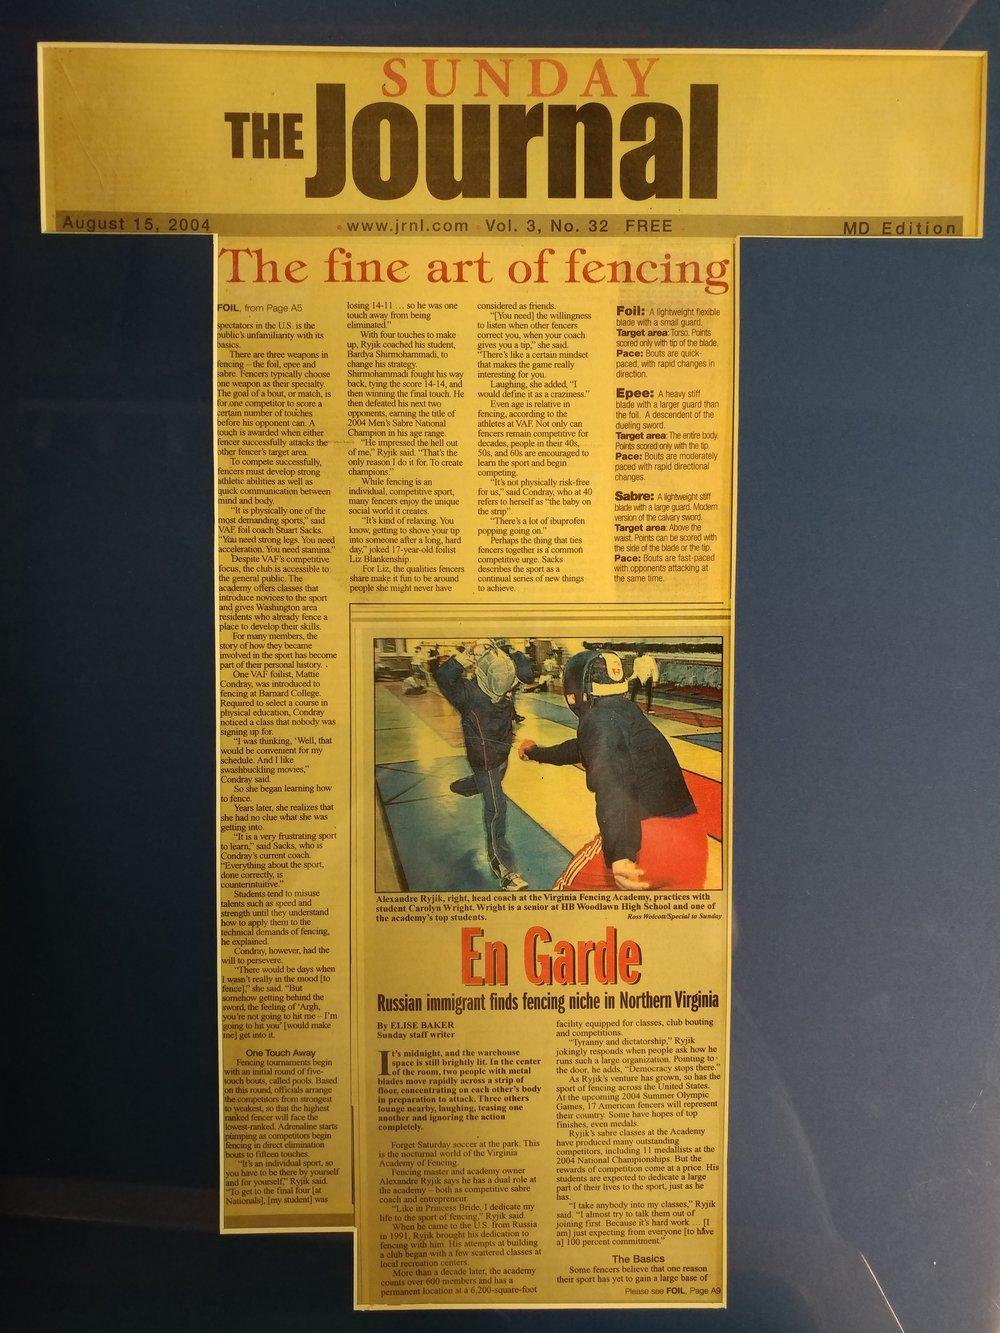 The Sunday Journal